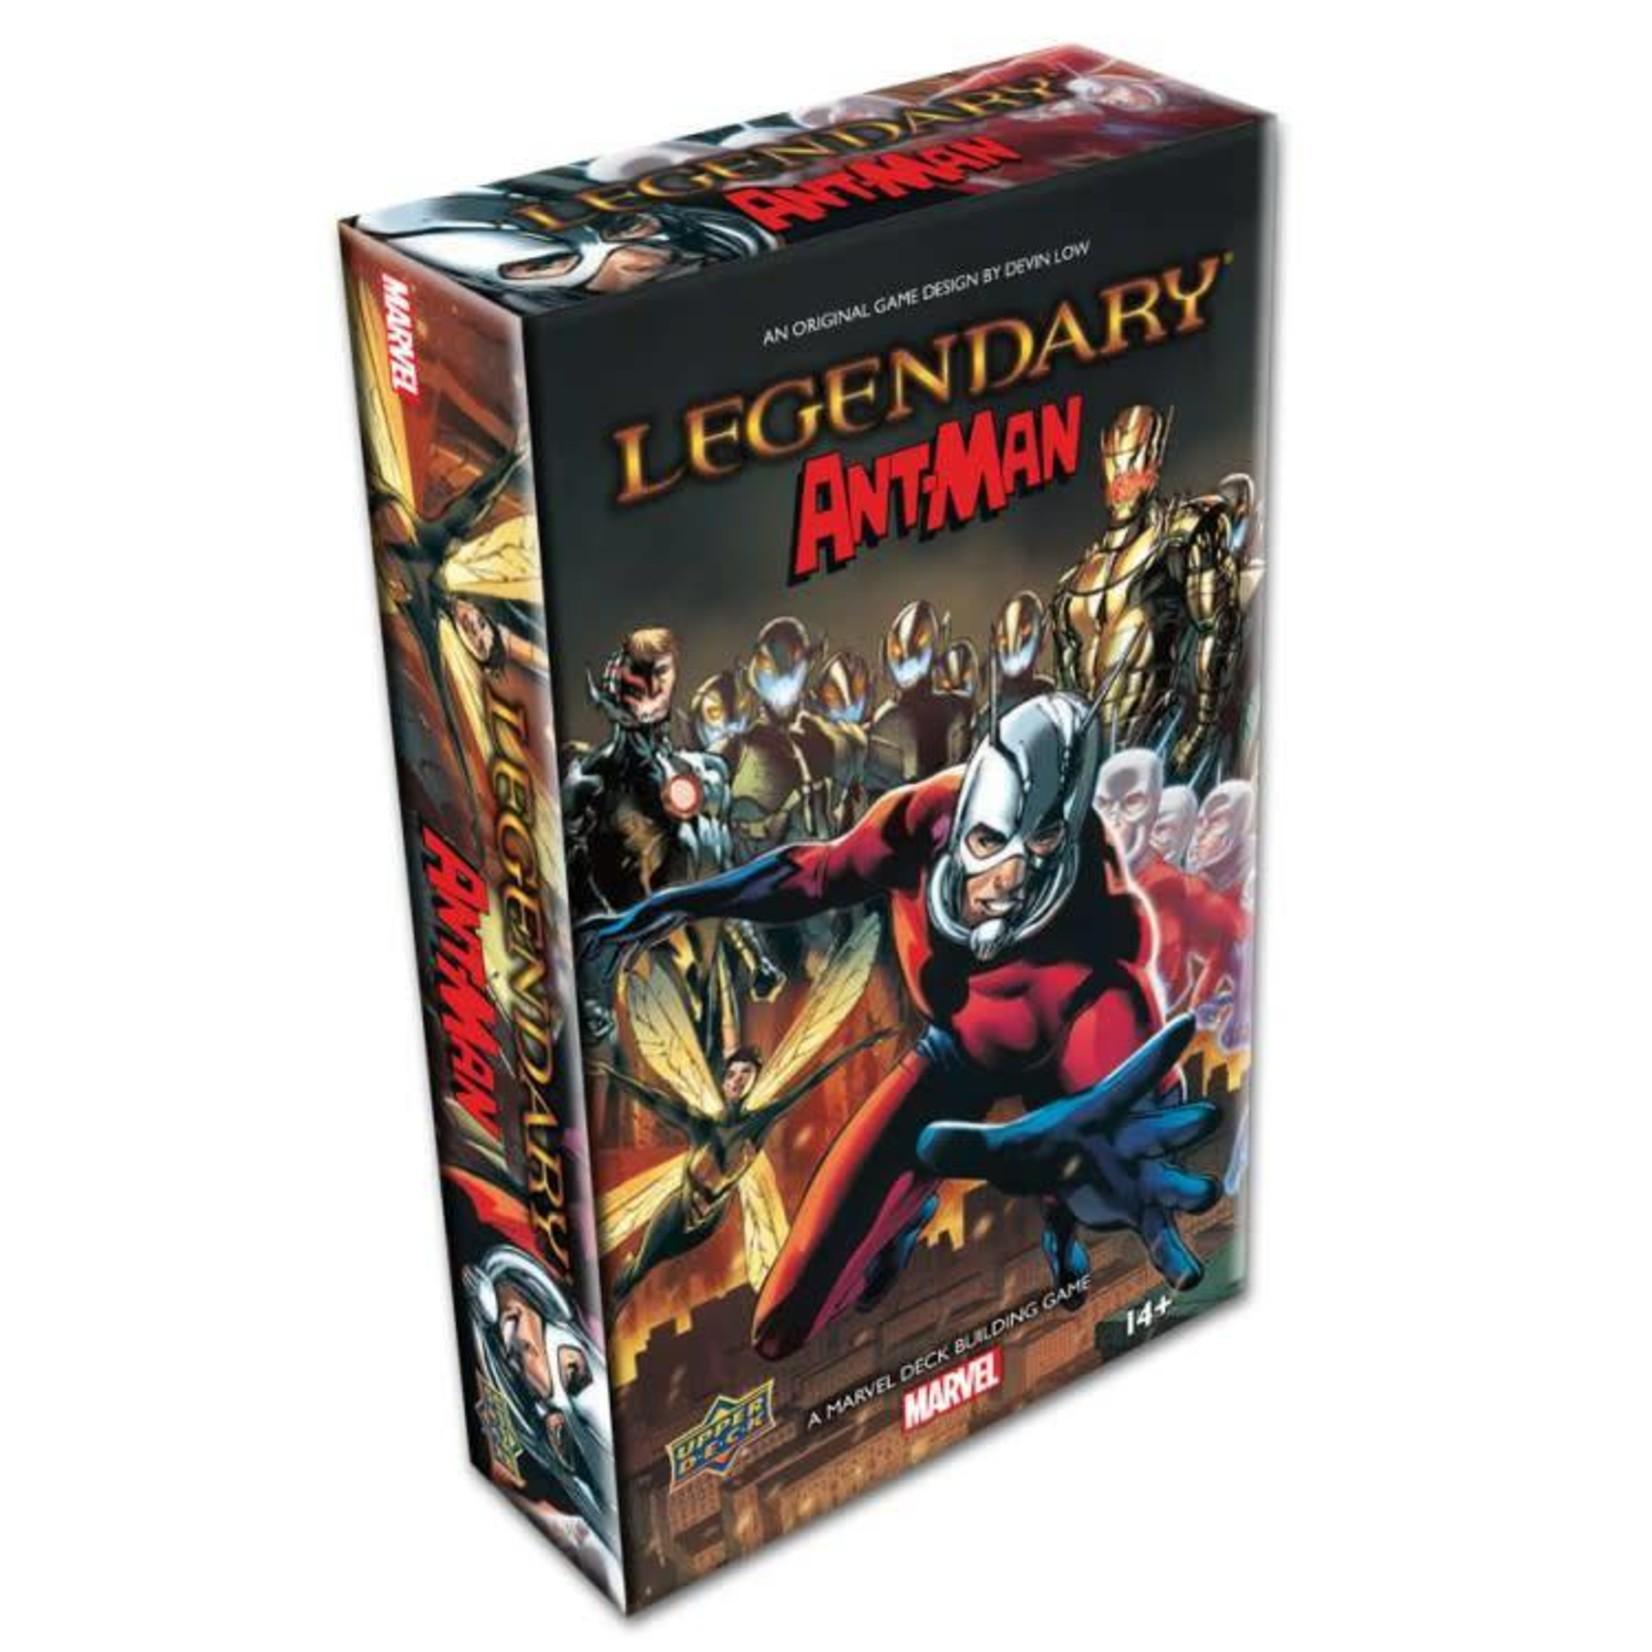 Upper Deck Legendary: Ant-Man Expansion